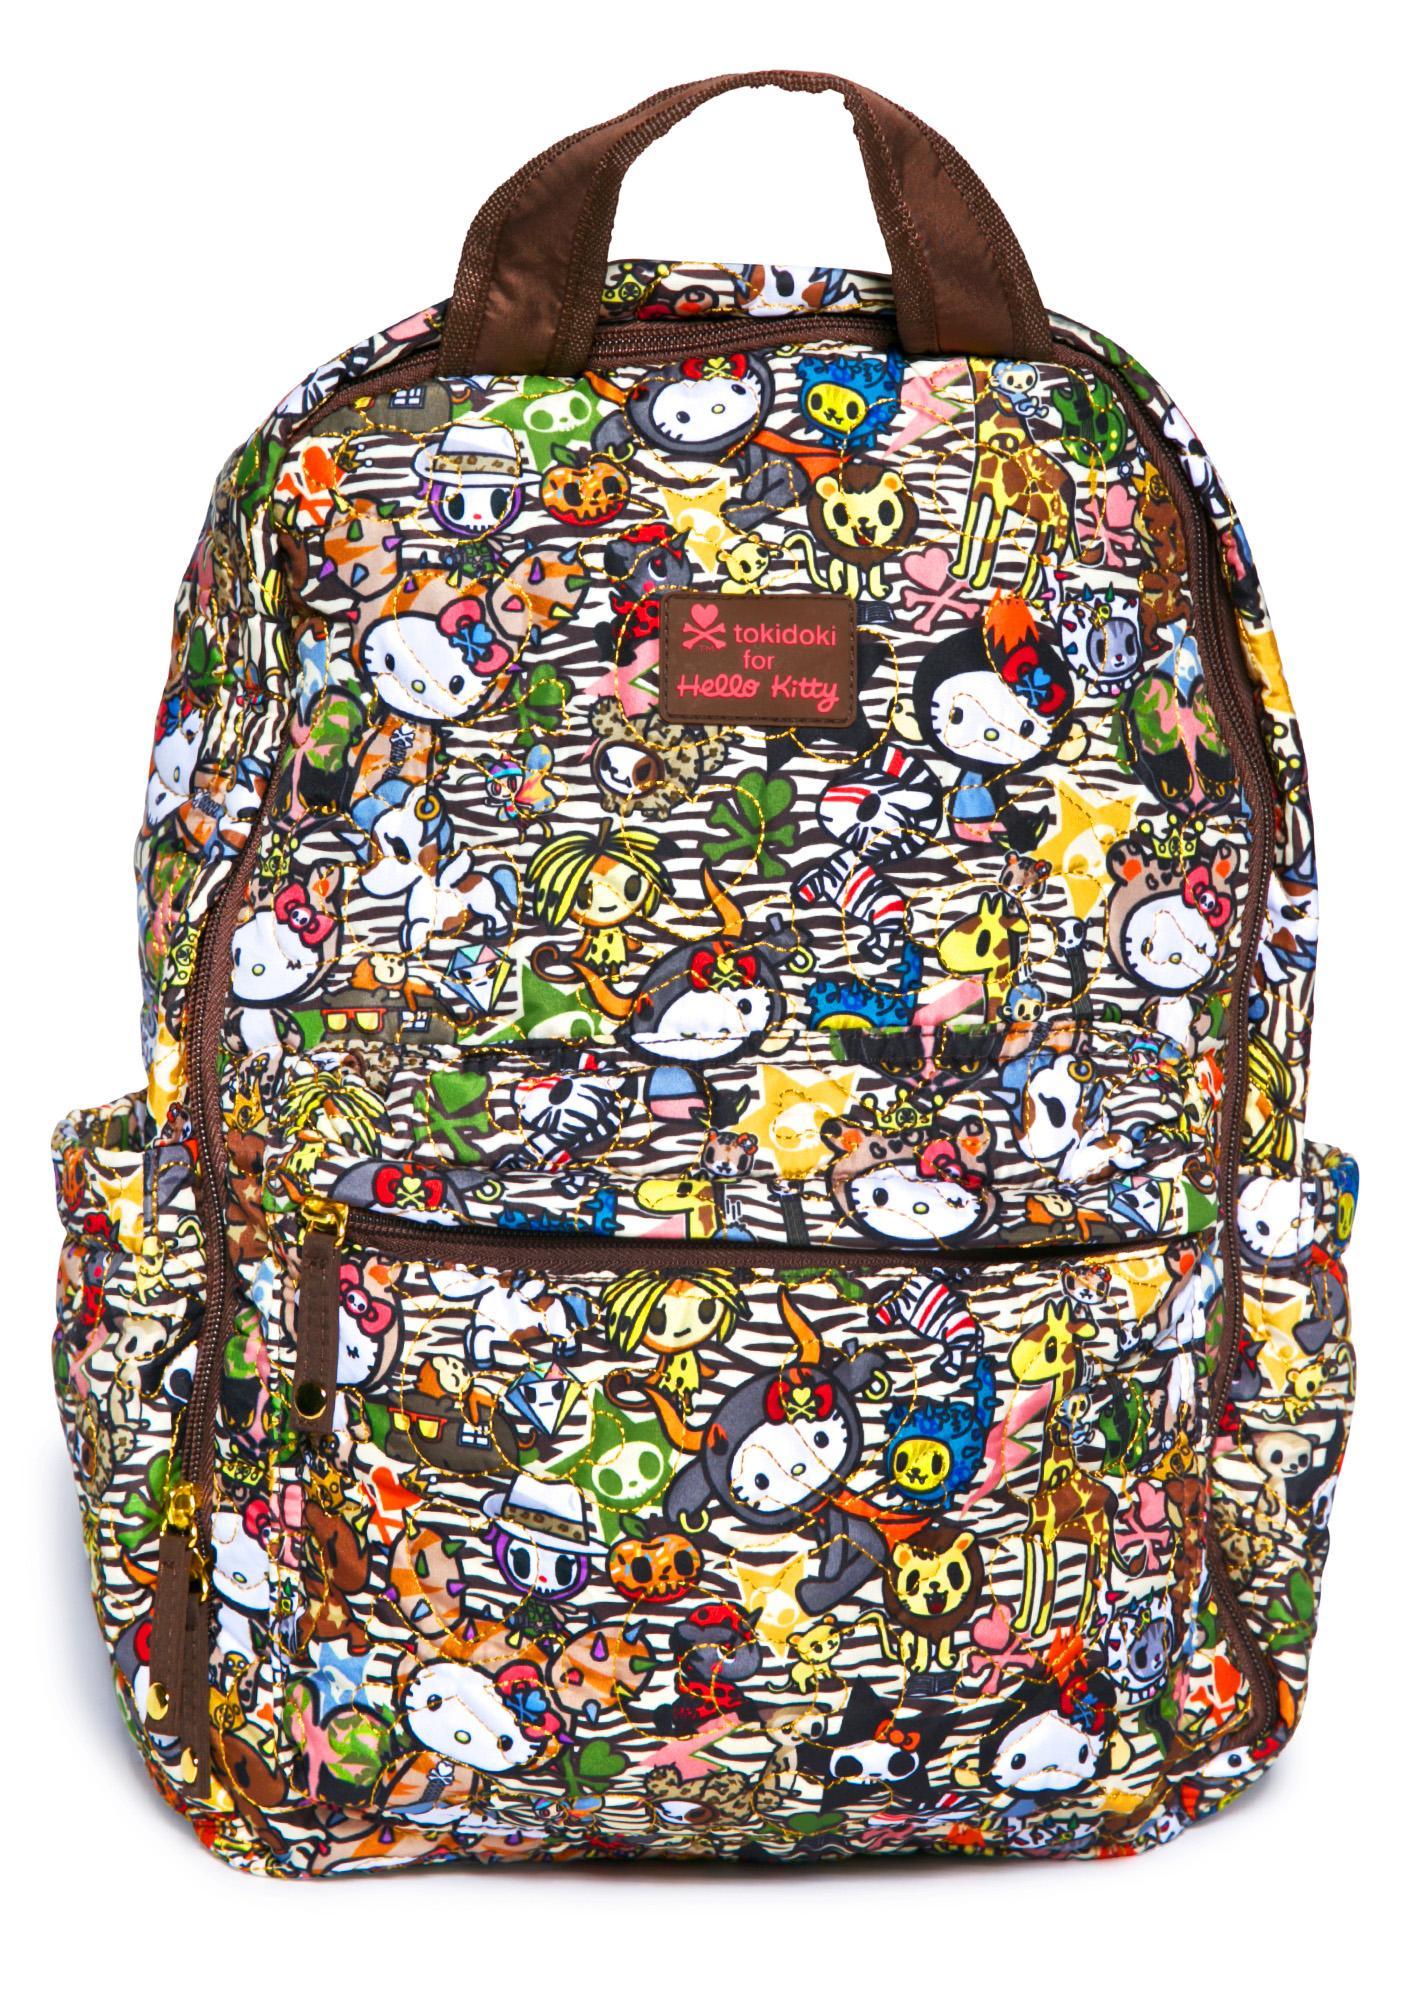 Sanrio Tokidoki X Hello Kitty Summer Safari Backpack